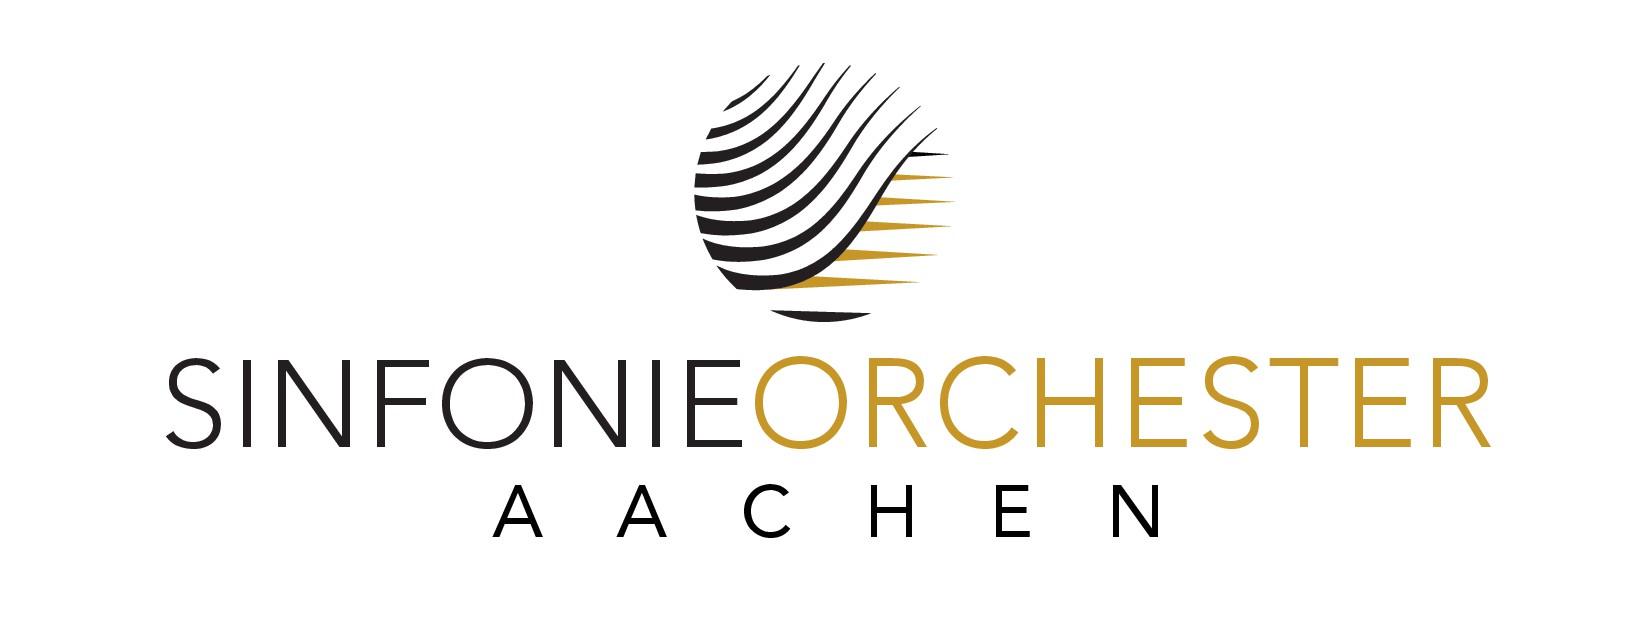 Powerful modern logo for aspiring orchestra